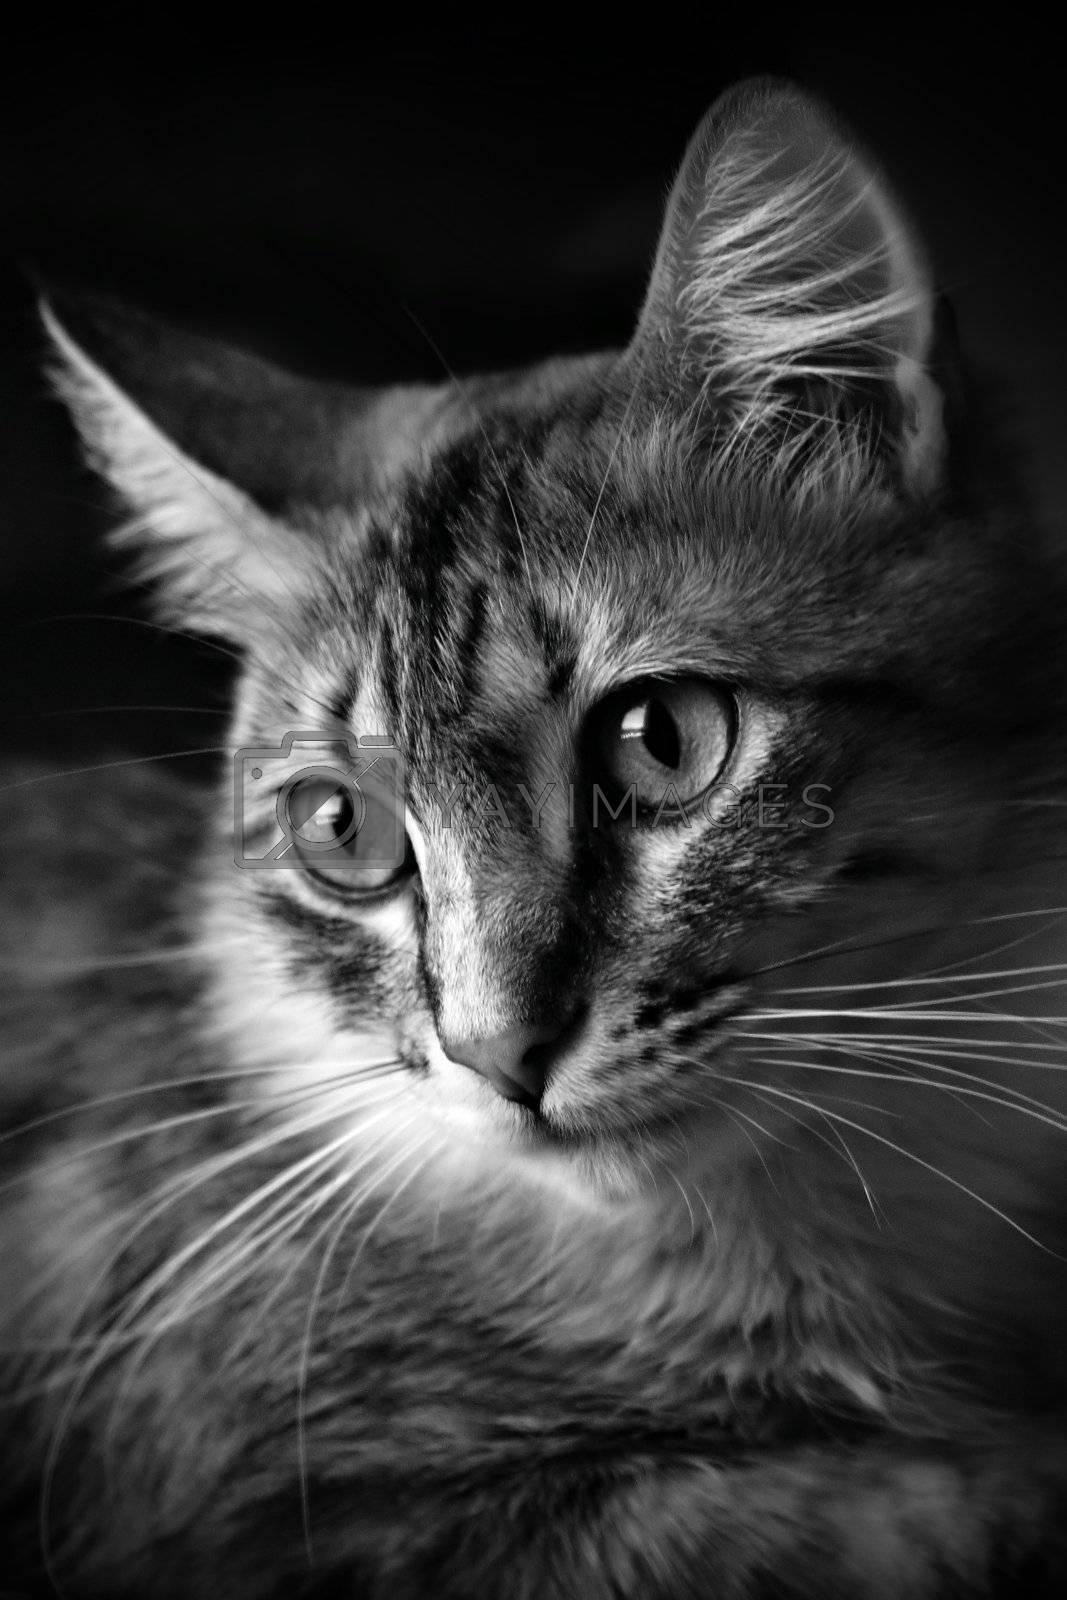 Black & White cat in black background